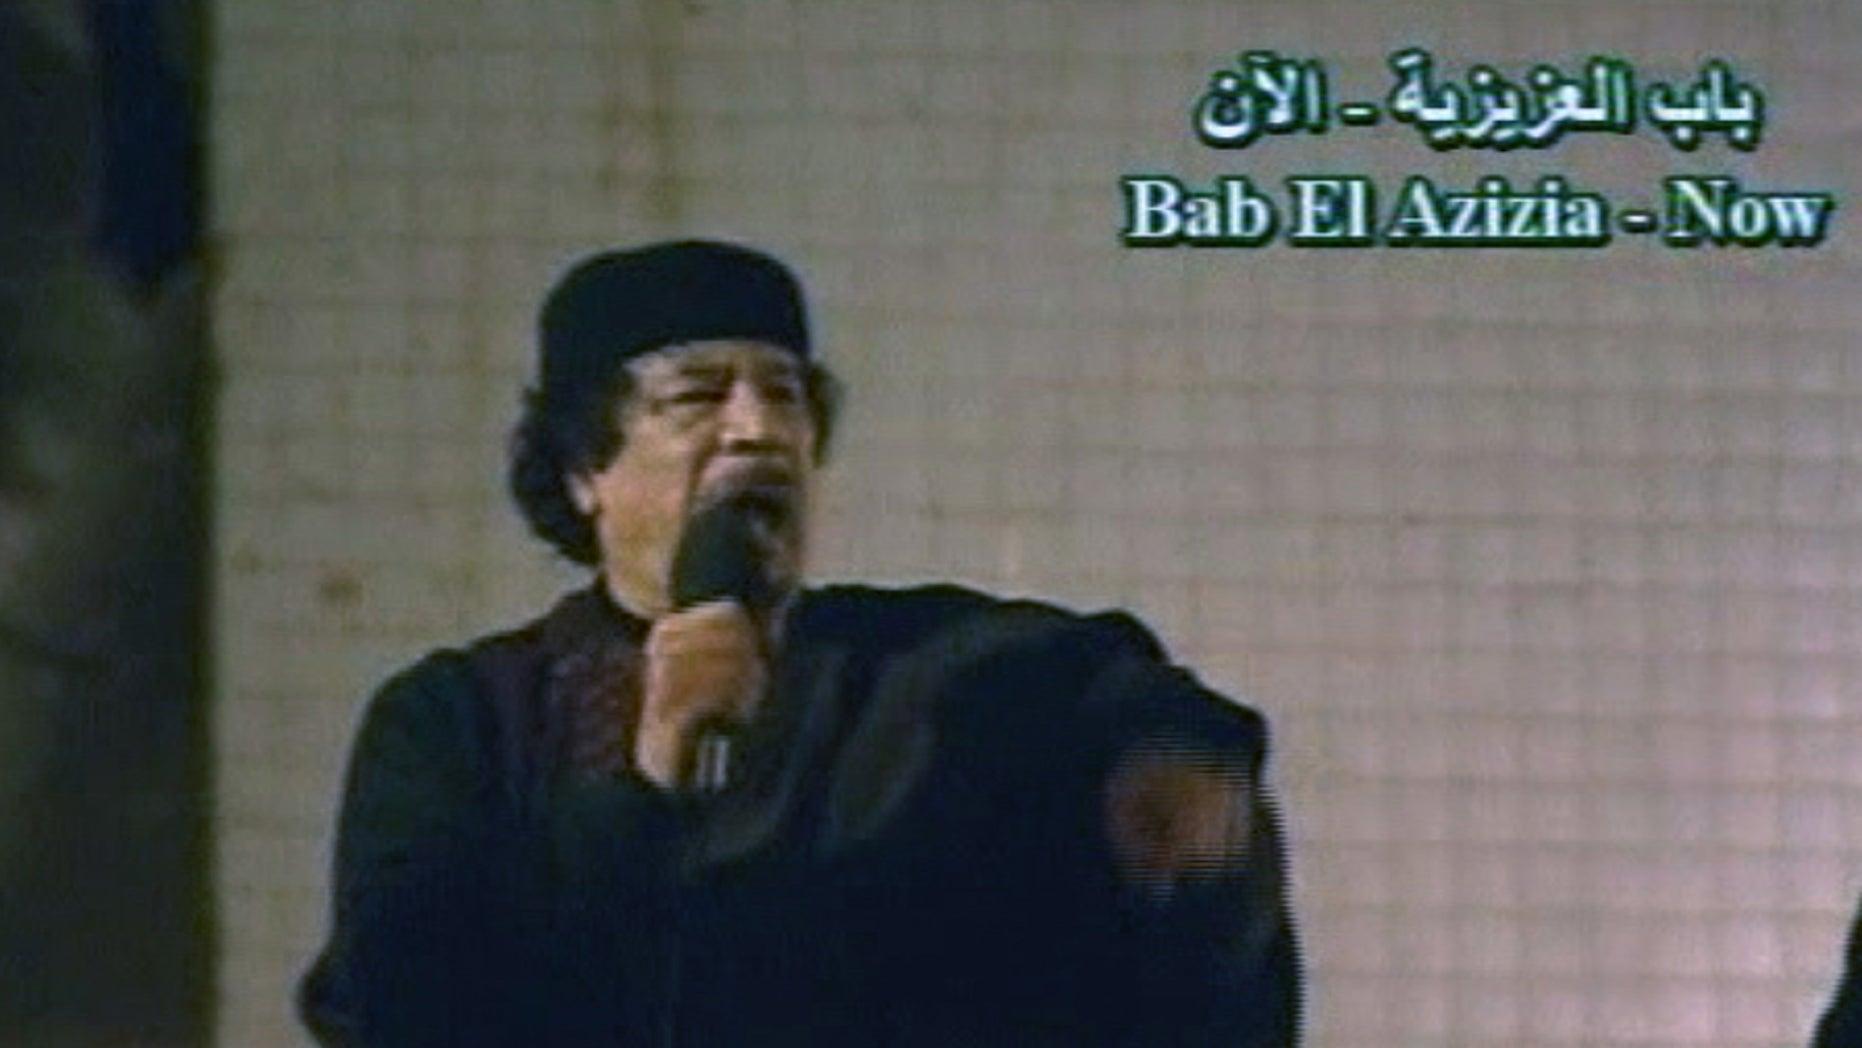 March 22: In this image taken from Libyan State TV, Libyan leader Muammar Qaddafi talks to a large crowd in Bab El Azizia, Libya. (AP)